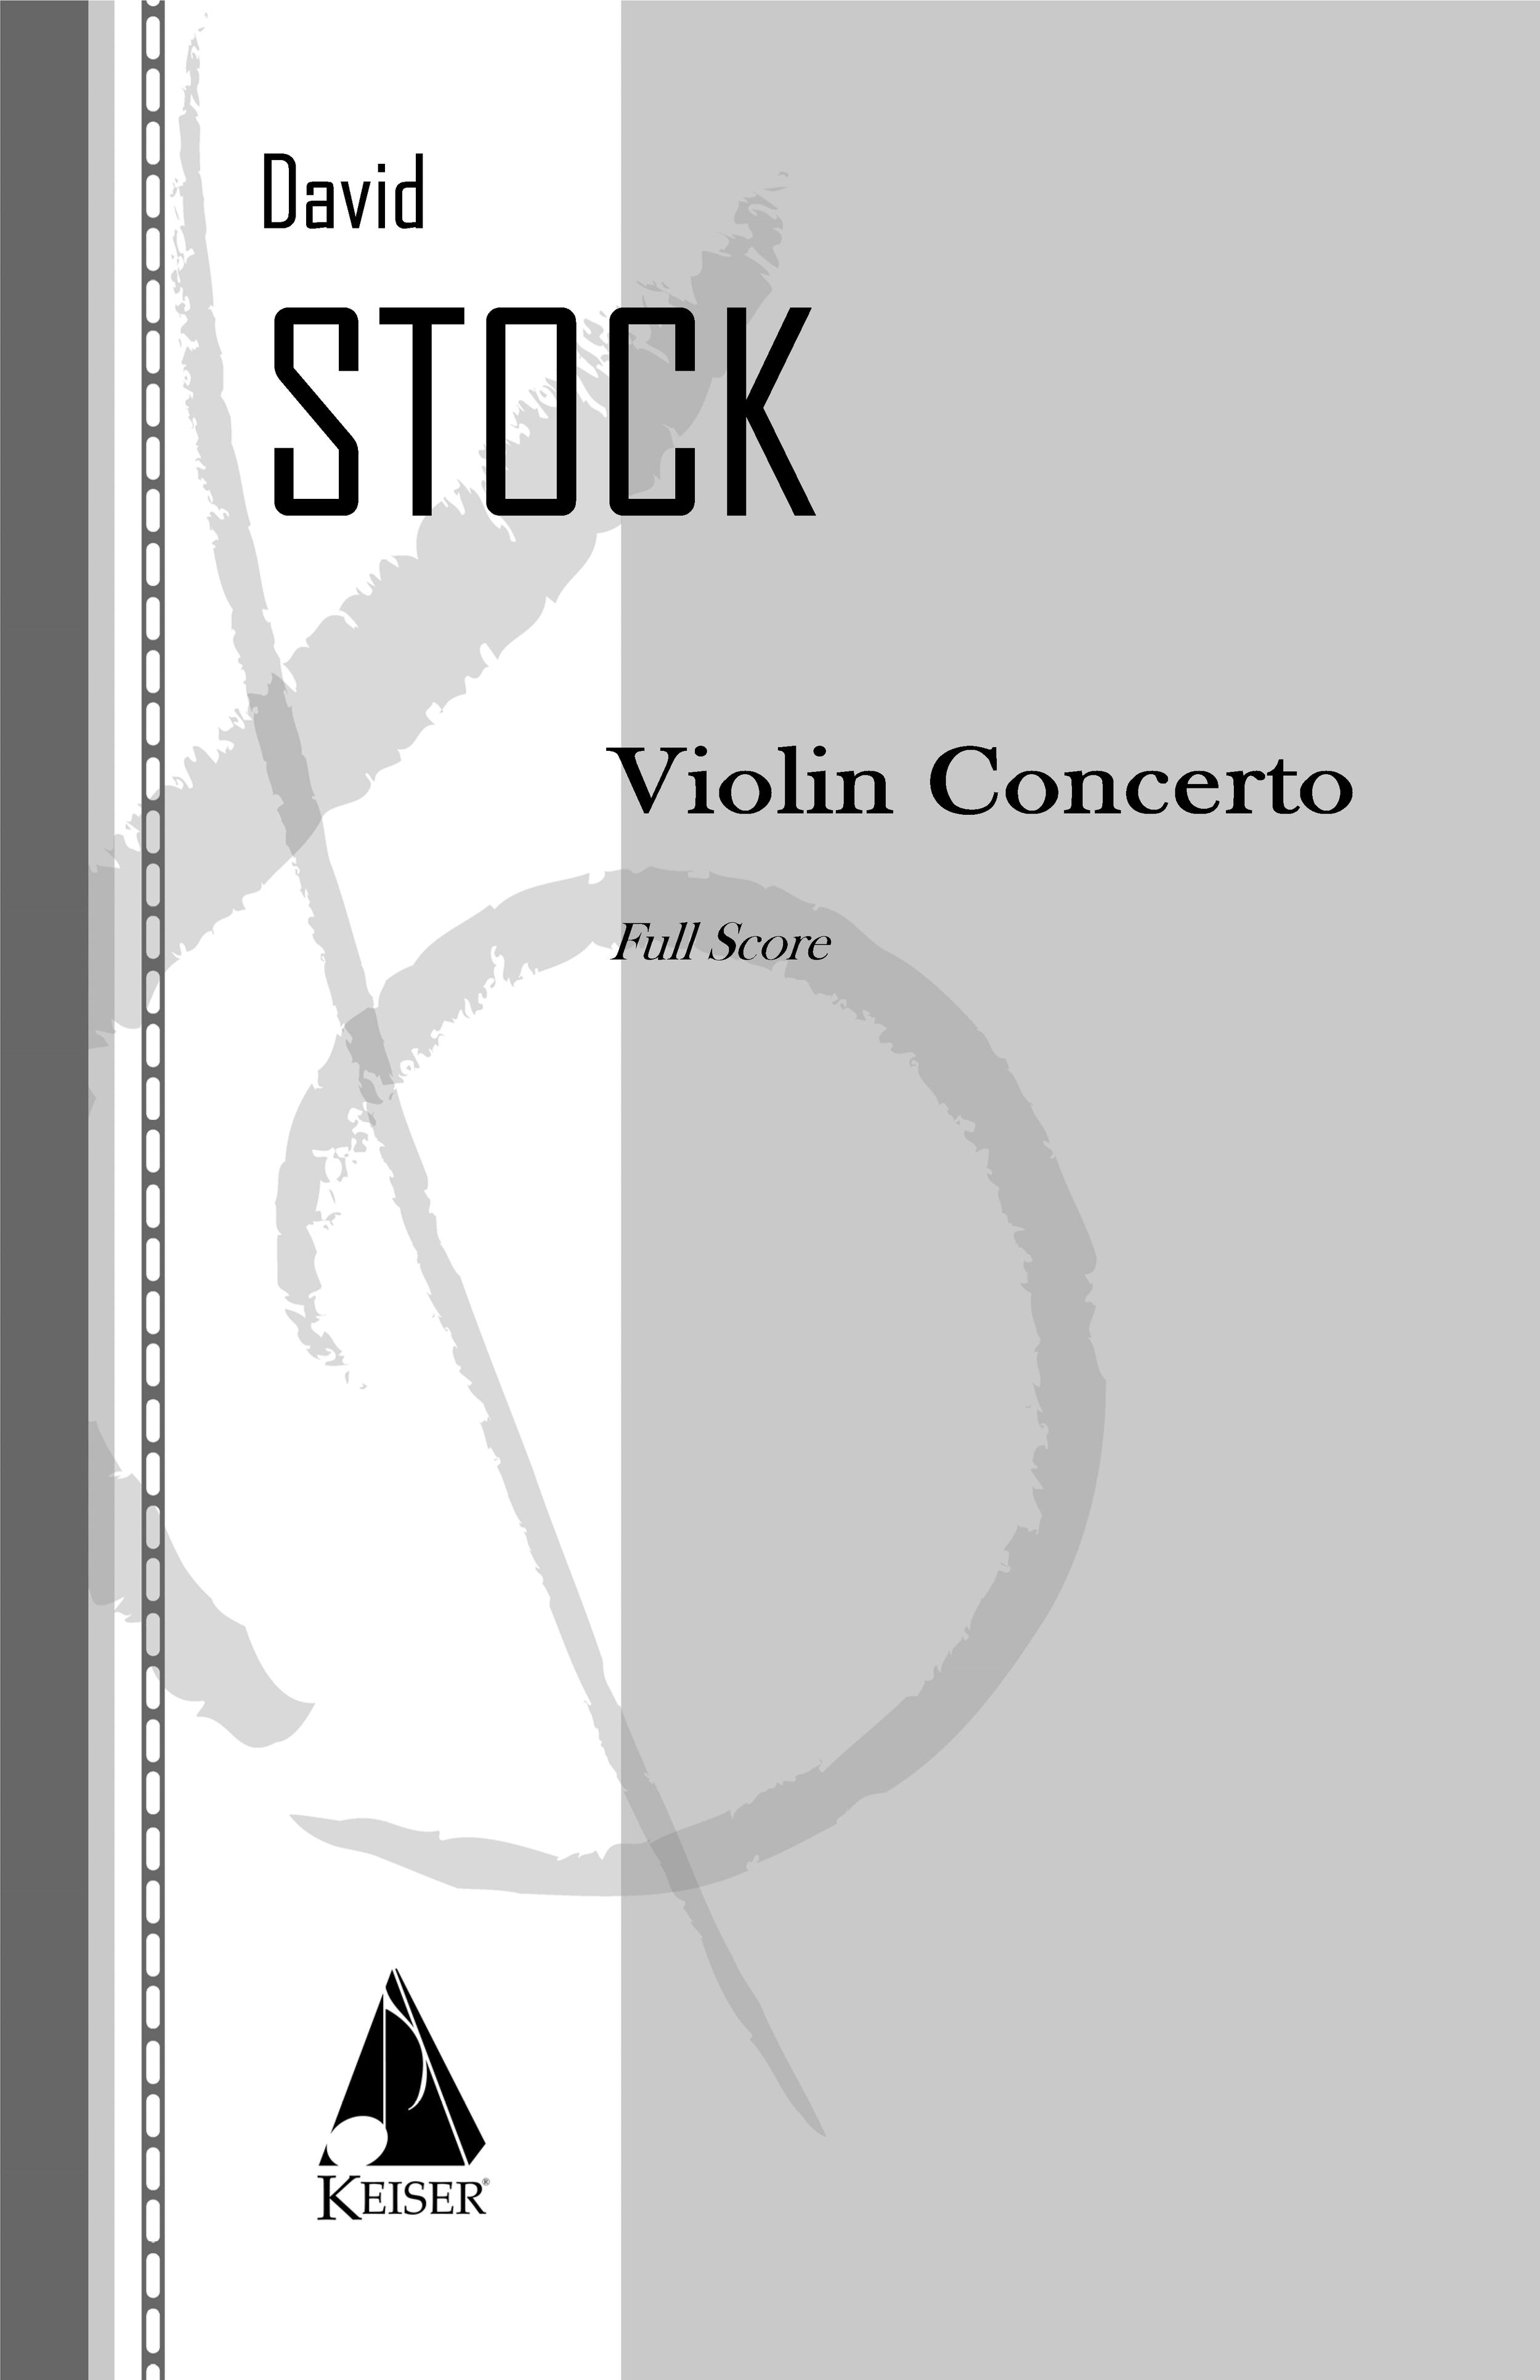 Violin Concerto(1995) - Violin Solo: 2(1d Picc, Alto Flute)+Picc.2+EH.2(1d Eb Clar)+BCl.2+Cbsn: 4.3.3.1: Timp.Perc(3).Hp: StrRent/Buy:Keiser Music